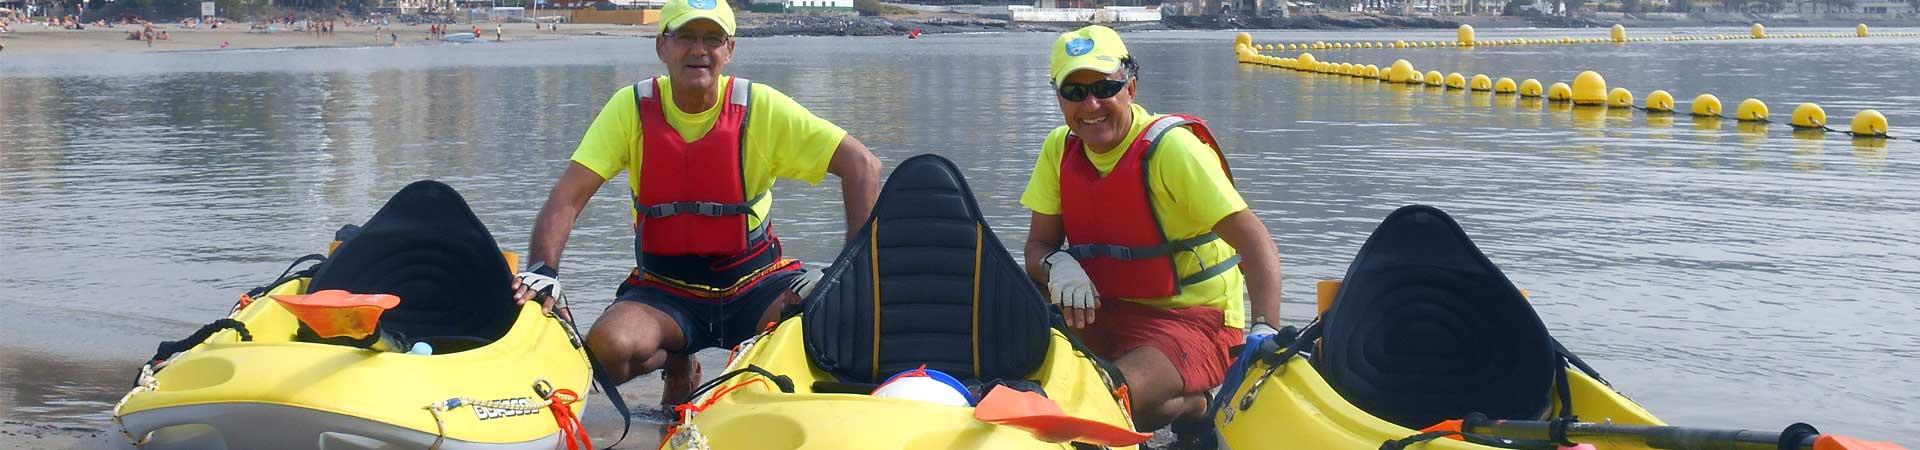 https://www.goodmorningtenerife.com/wp-content/uploads/2015/02/03_tenerife-snorkelling-kayaking_slide-1920x450.jpg